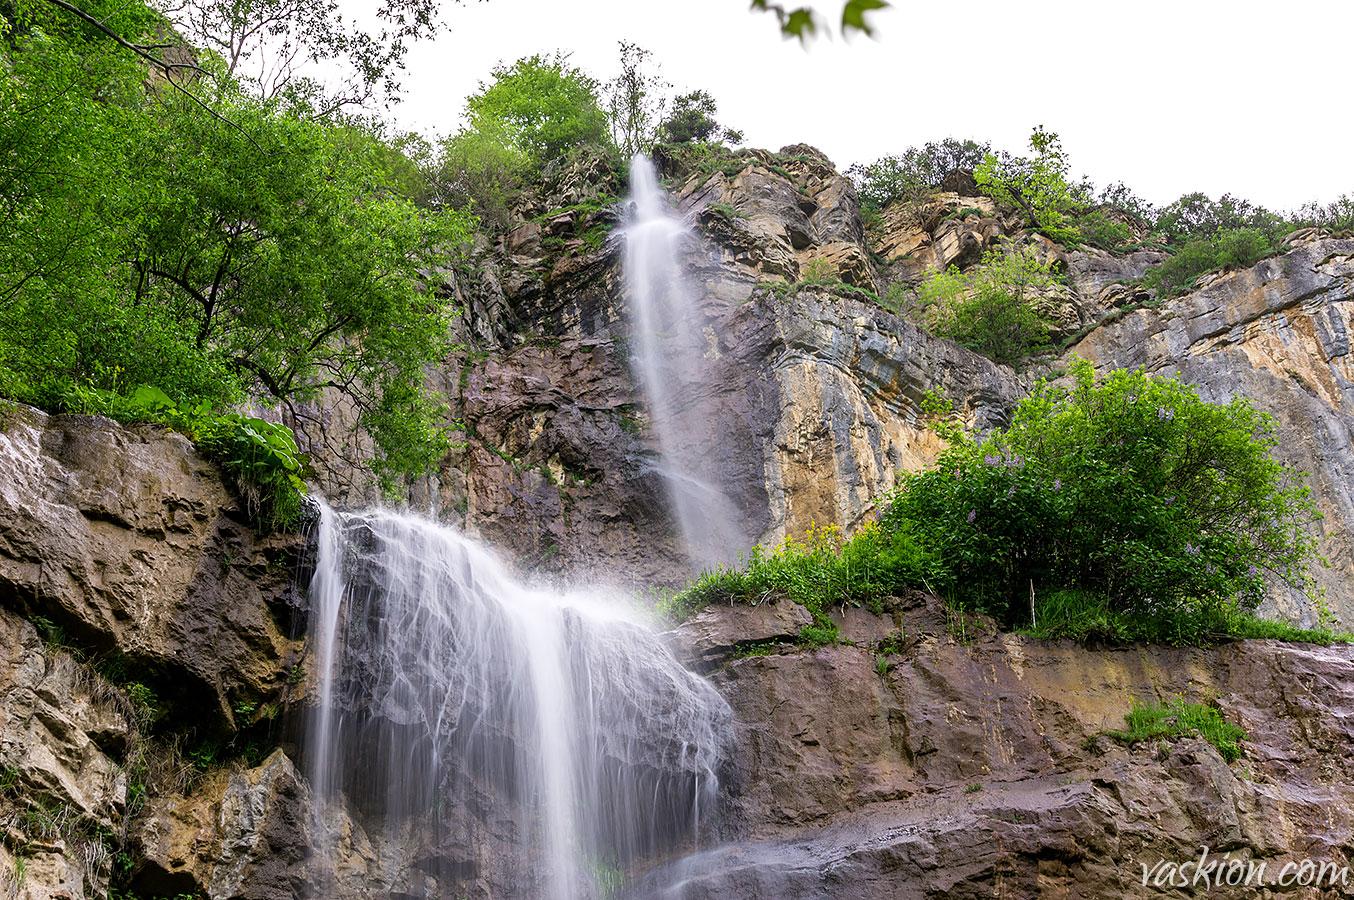 Skaklia Waterfall